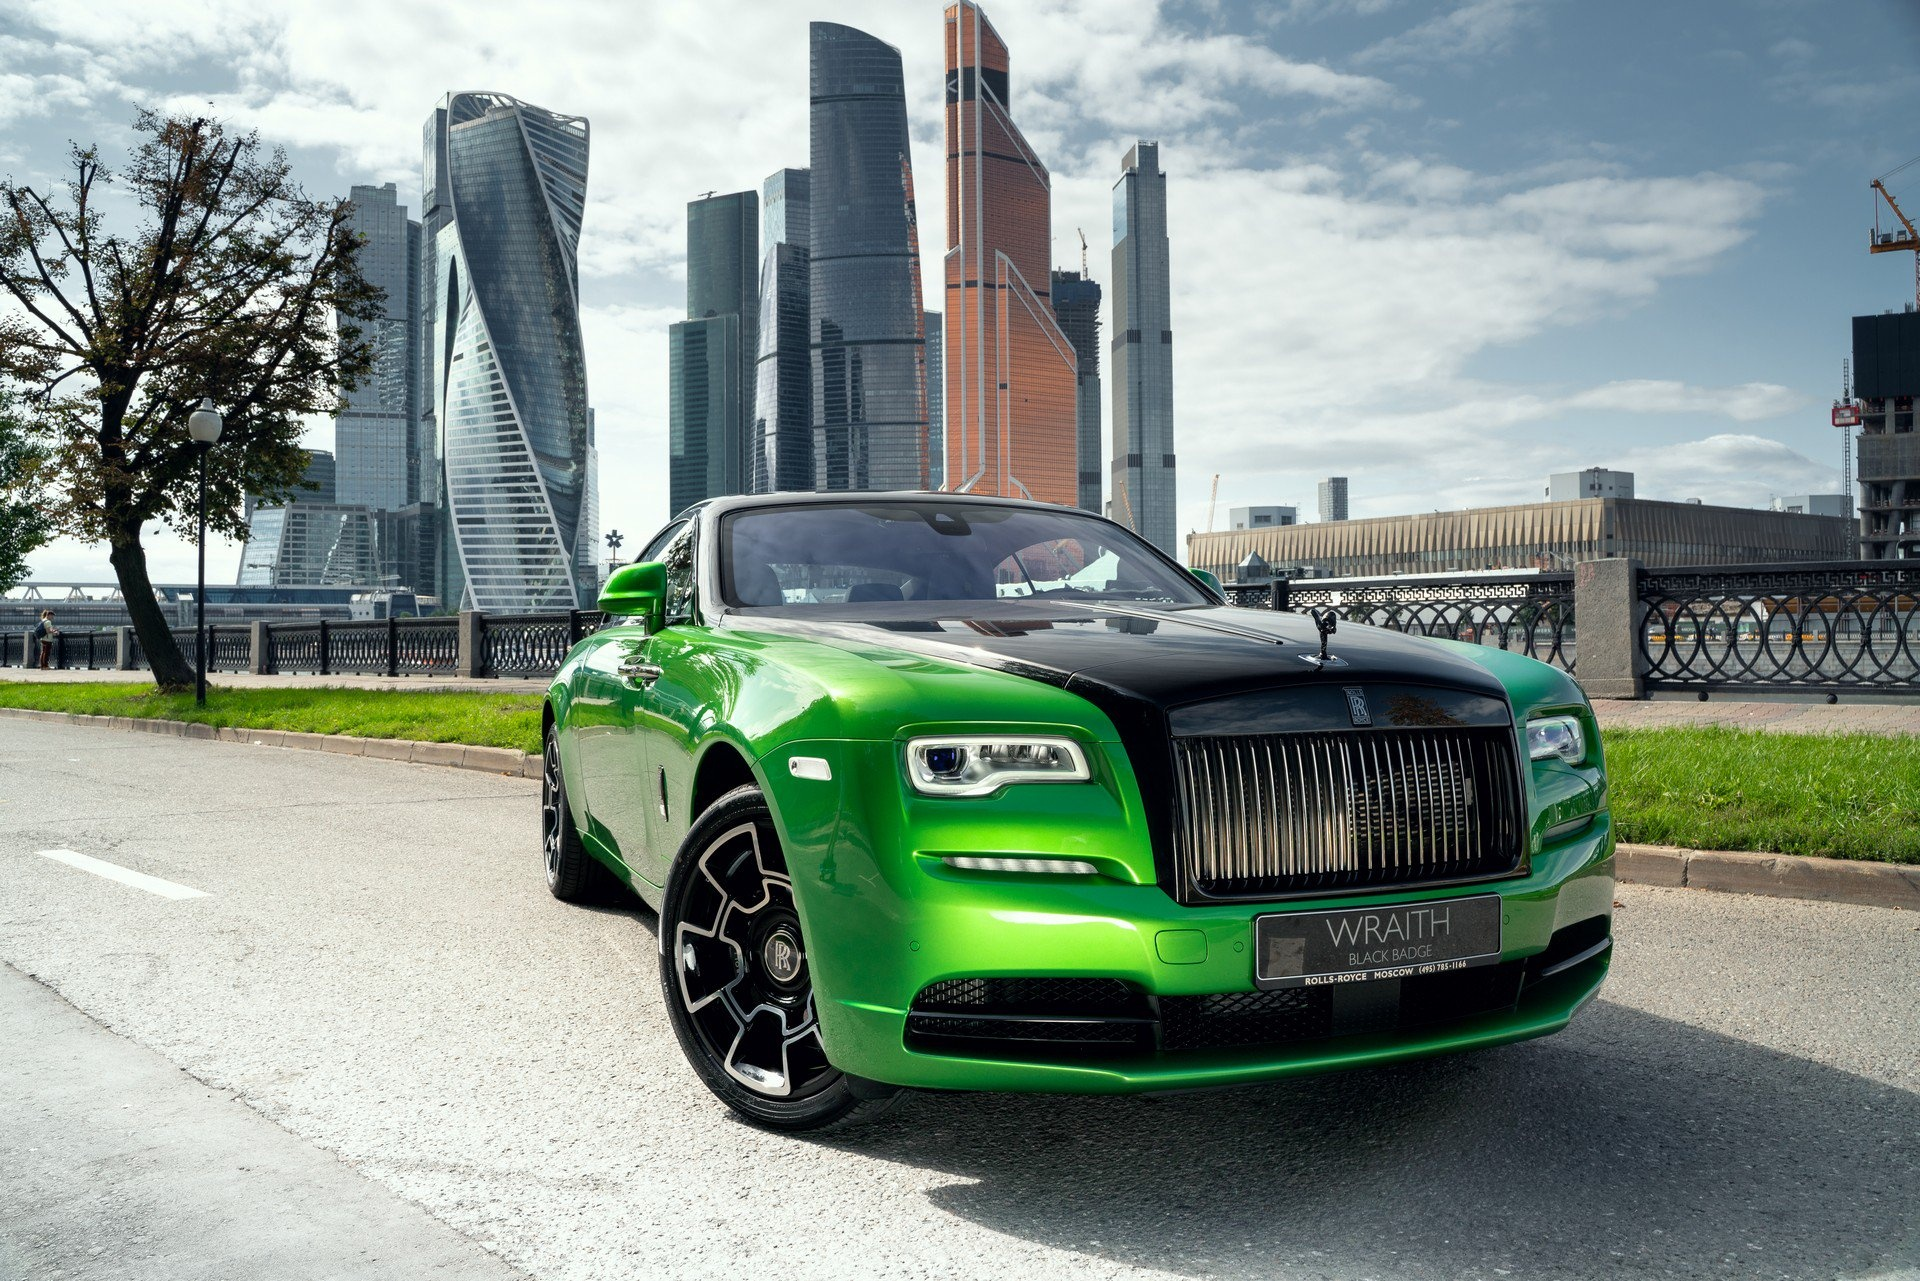 Ngam bo suu tap Rolls-Royce dac biet 'Dem Moscow' hinh anh 5